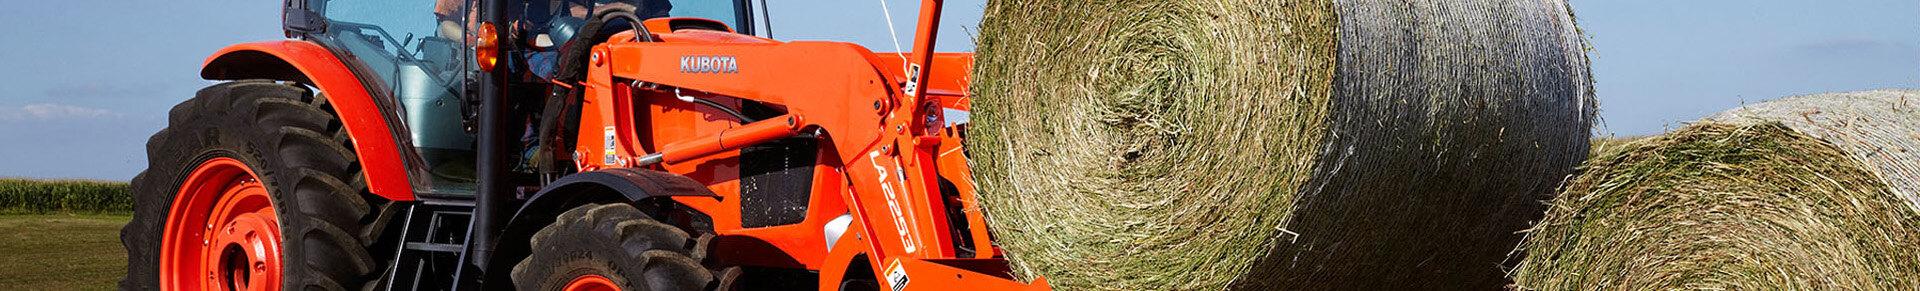 NEW INVENTORY - WEAGANT FARM SUPPLIES - BROCKVILLE ONTARIO